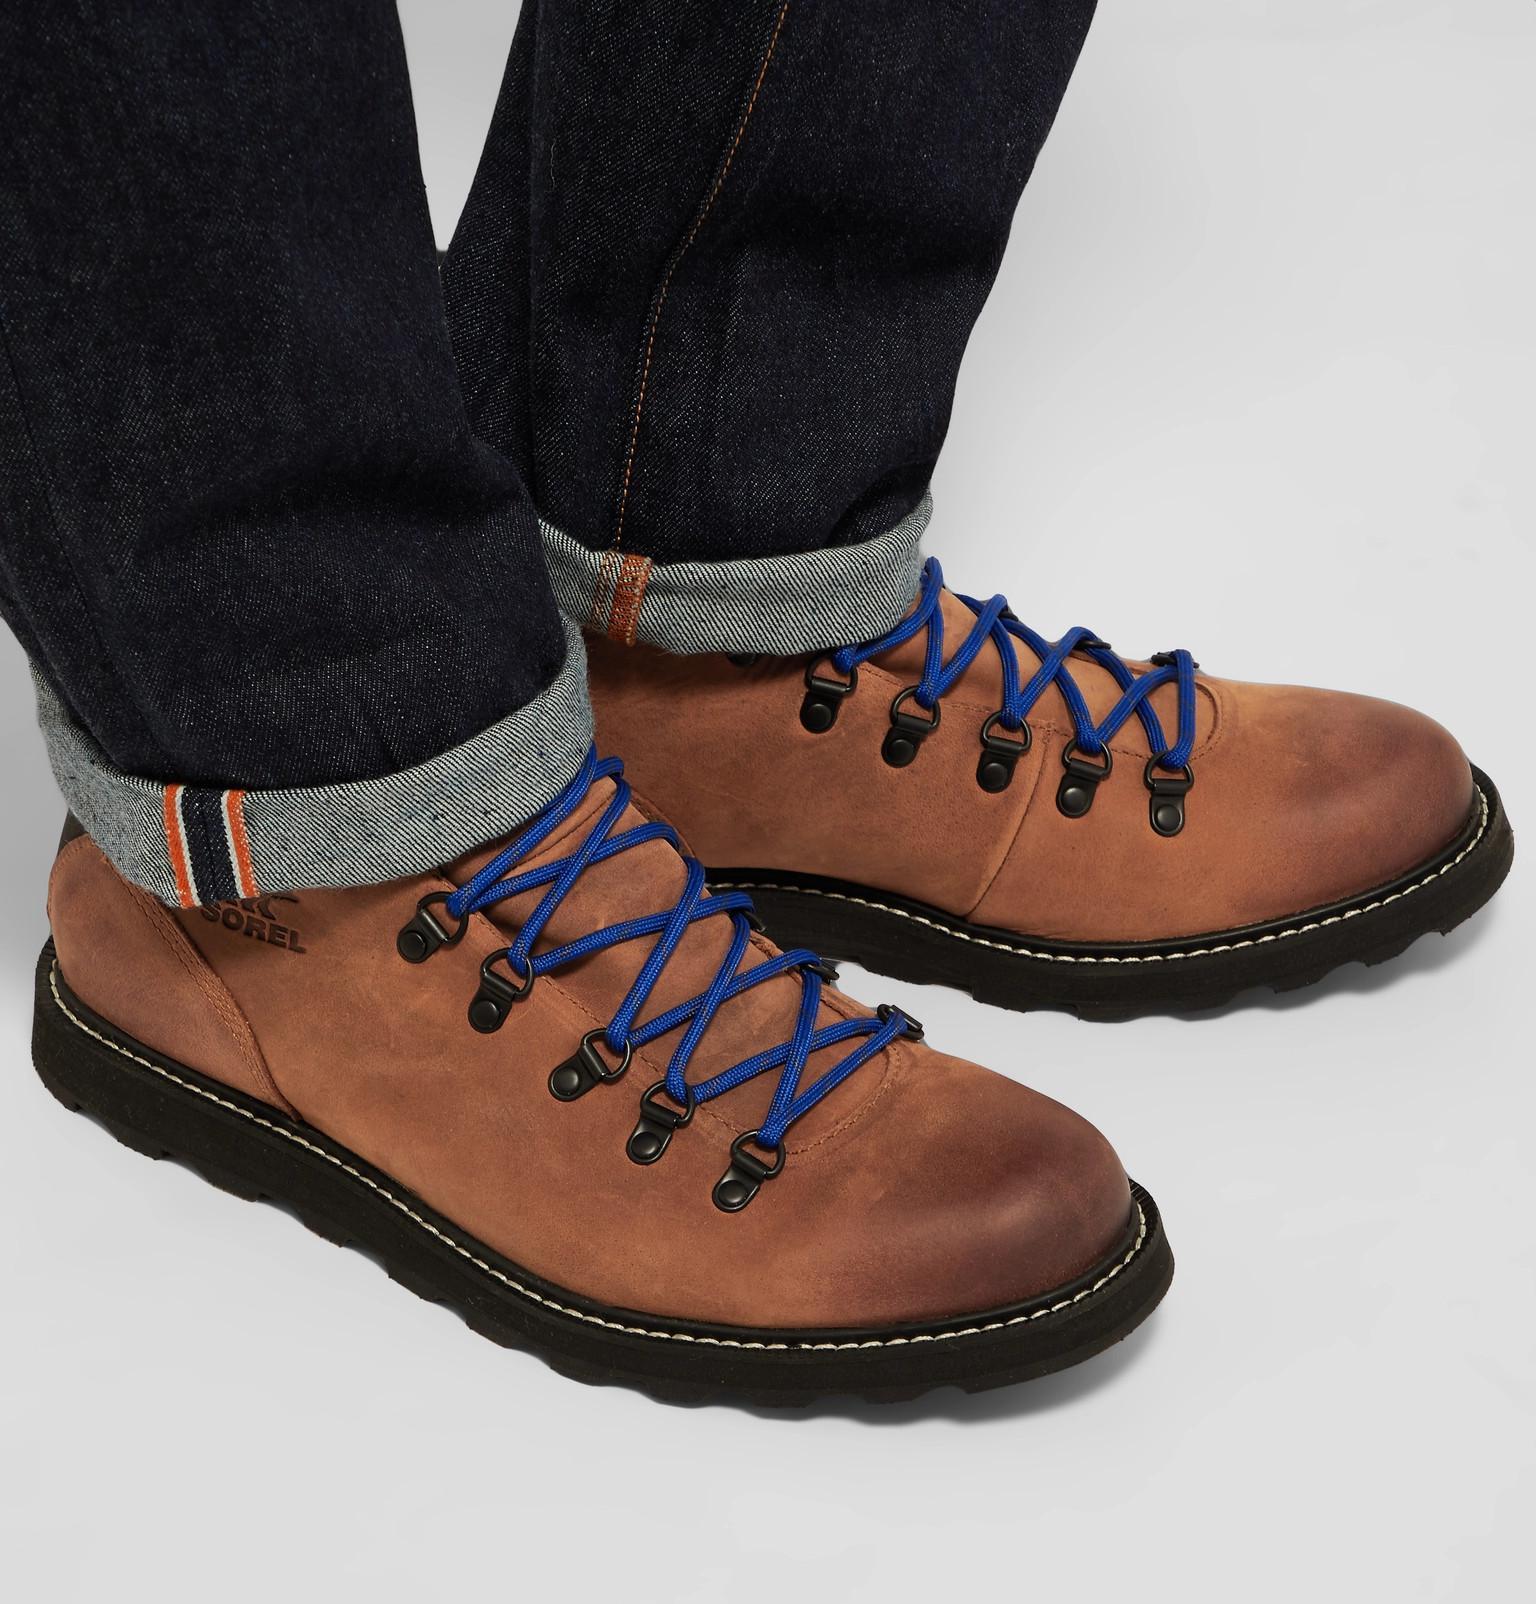 1e067afcb98 Sorel Blue Madson Hiker Waterproof Leather And Rubber-trimmed Nubuck Boots  for men